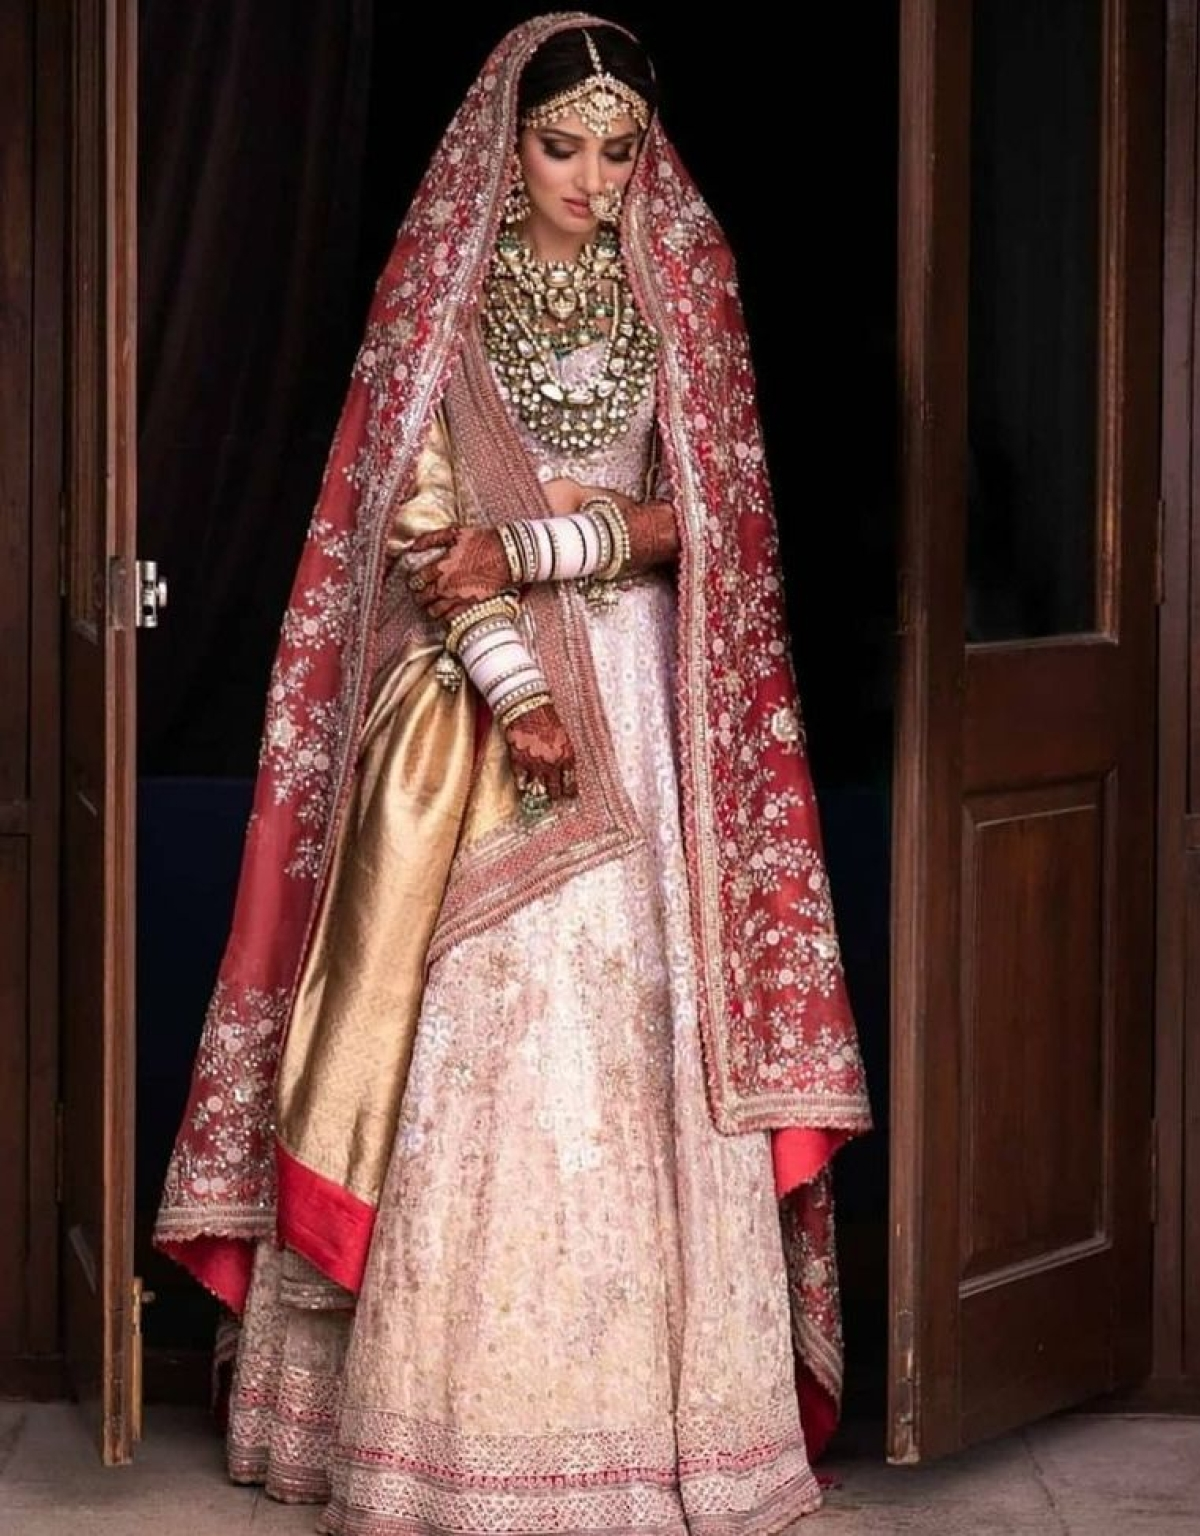 Varun Dhawan's bride Natasha Dalal copied THIS from Rana Daggubati's wife Miheeka Bajaj's wedding look